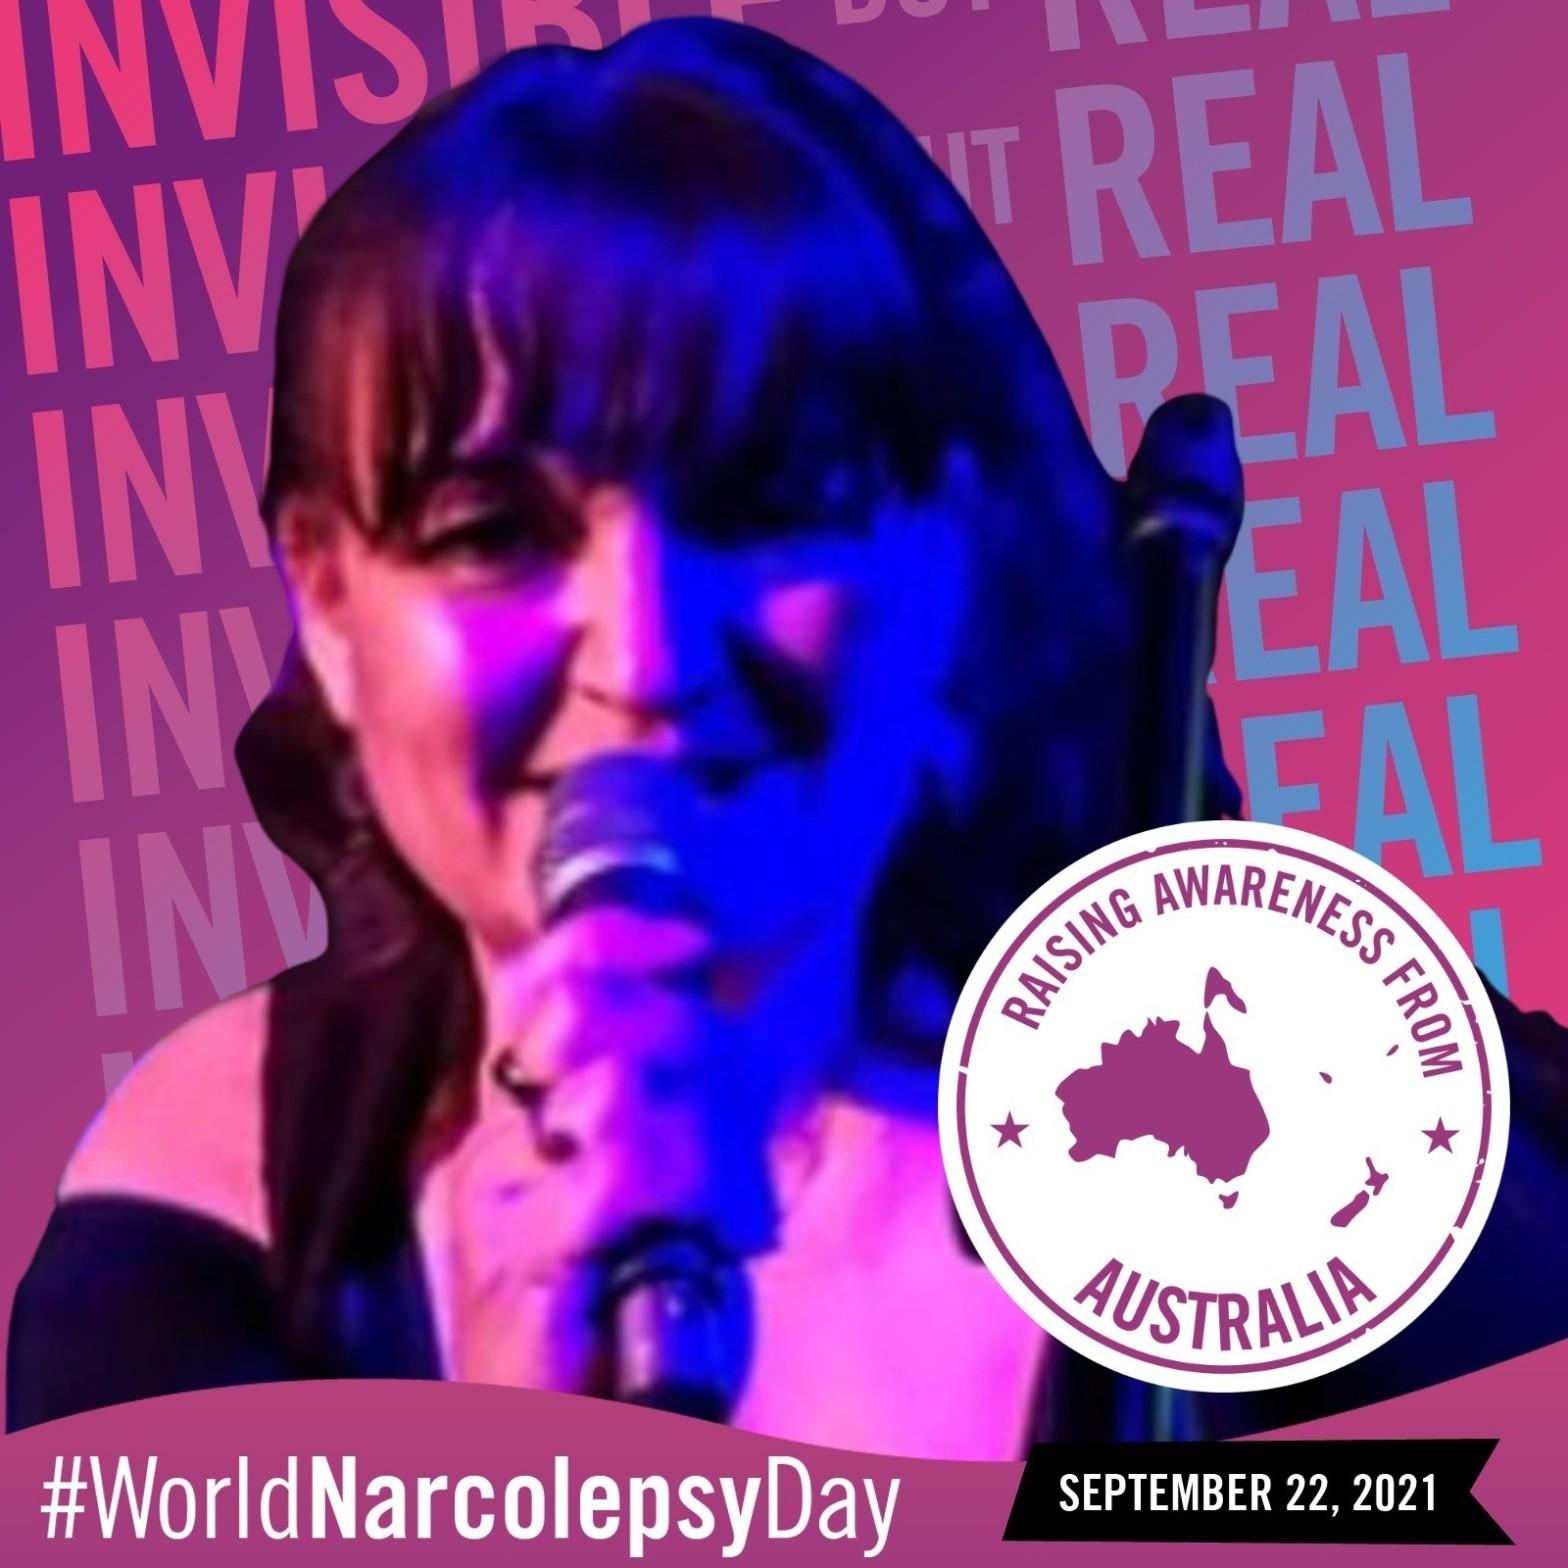 Raising awareness for World Narcolepsy Day